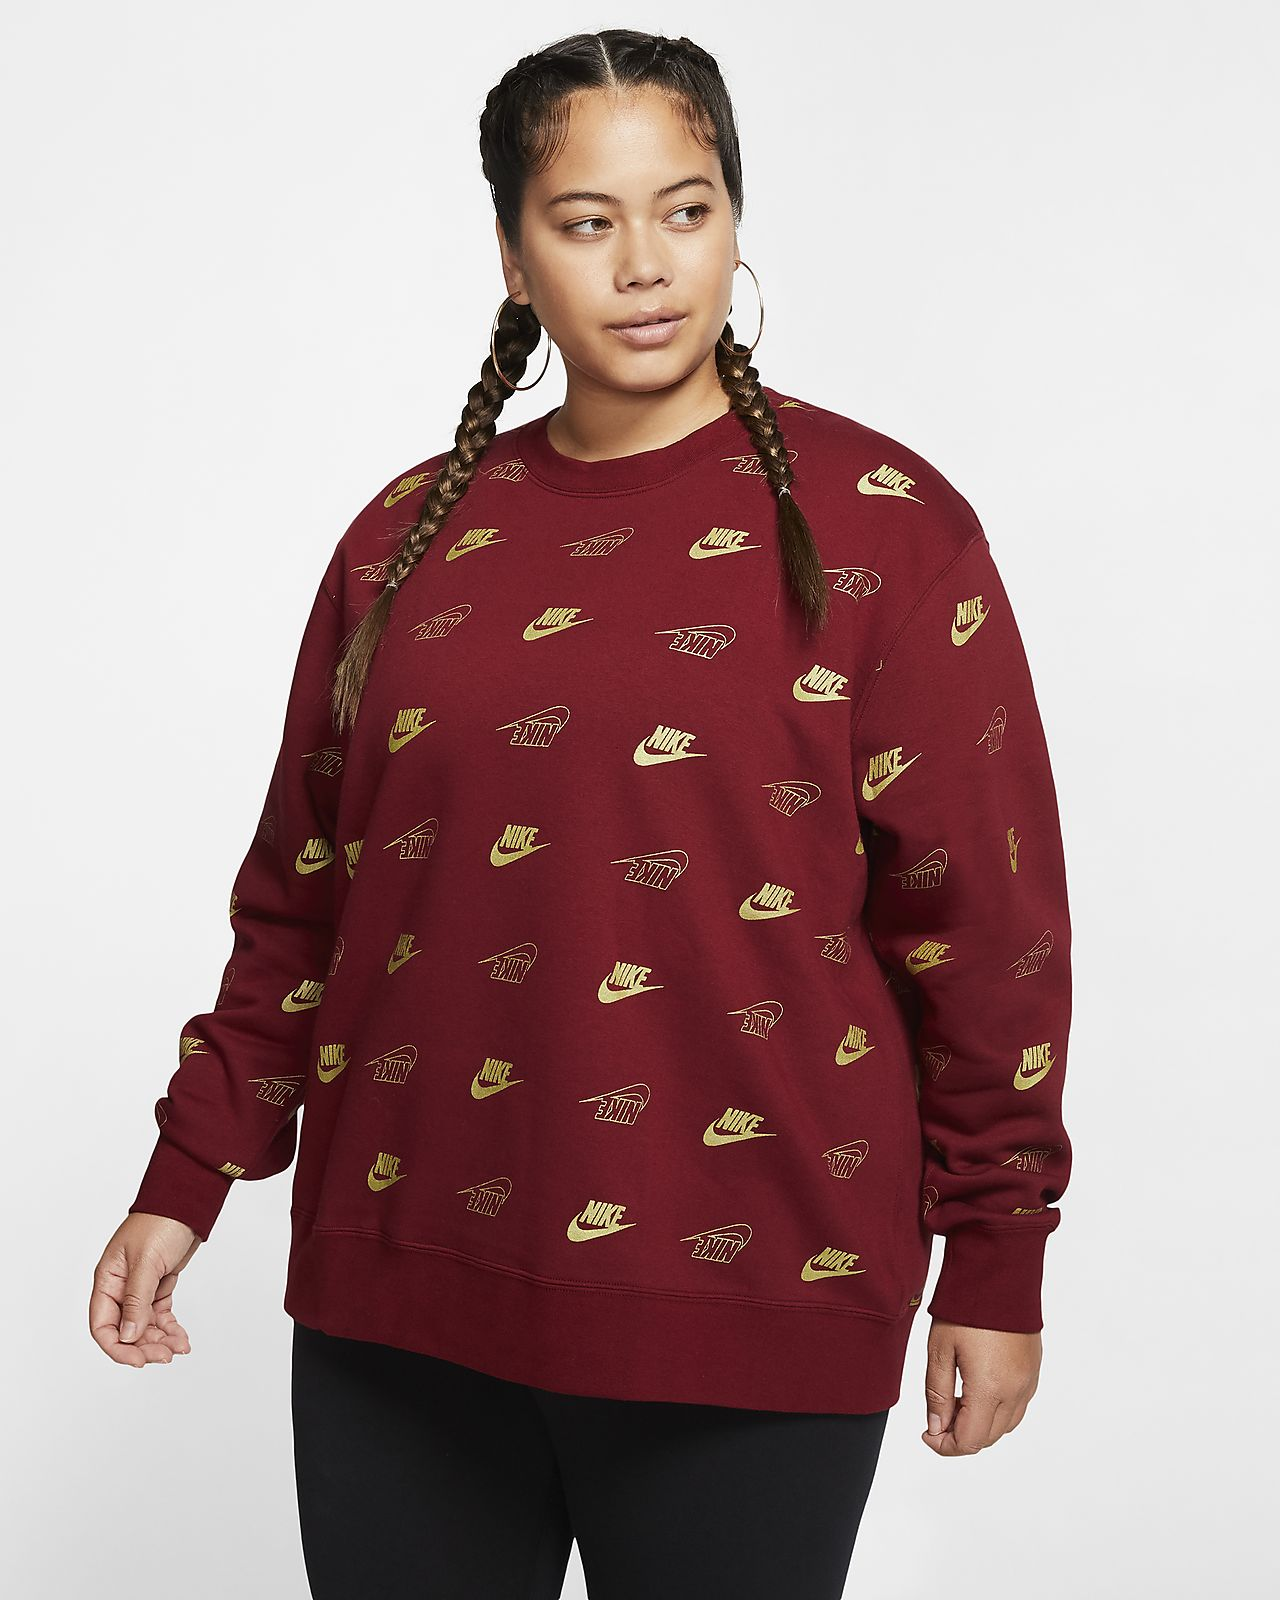 Camiseta de cuello redondo para mujer (talla grande) Nike Sportswear